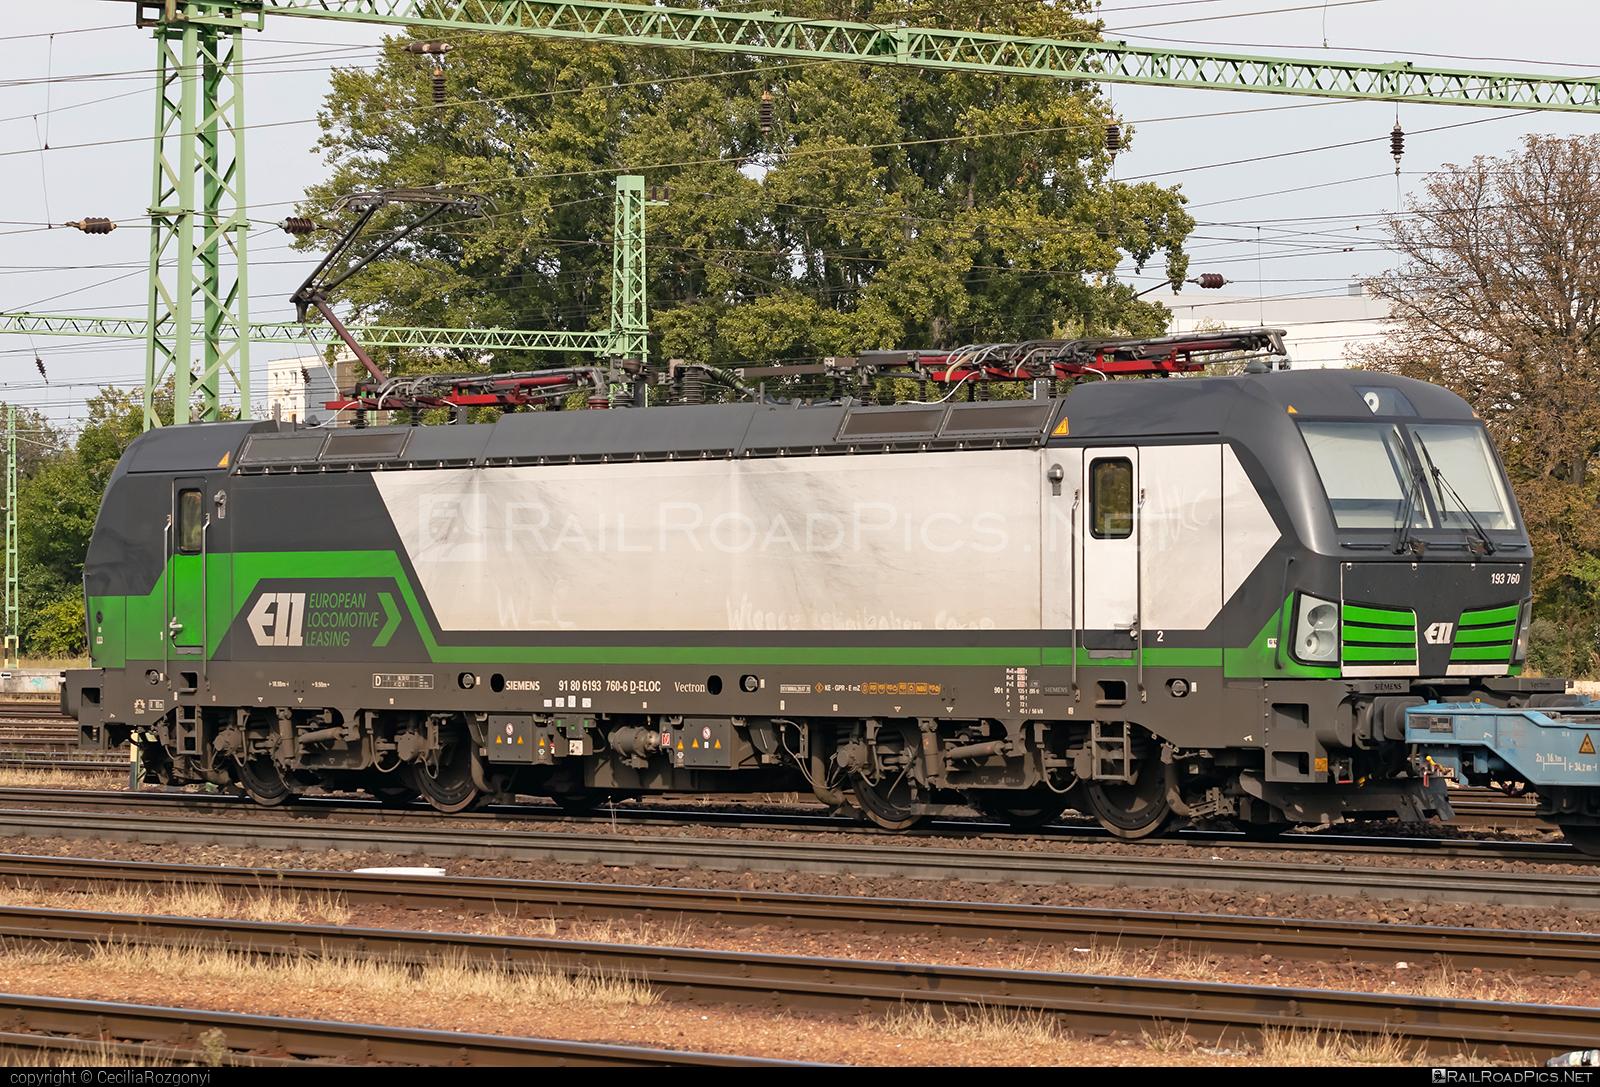 Siemens Vectron MS - 193 760 operated by ecco-rail GmbH #eccorail #eccorailgmbh #ell #ellgermany #eloc #europeanlocomotiveleasing #siemens #siemensvectron #siemensvectronms #vectron #vectronms